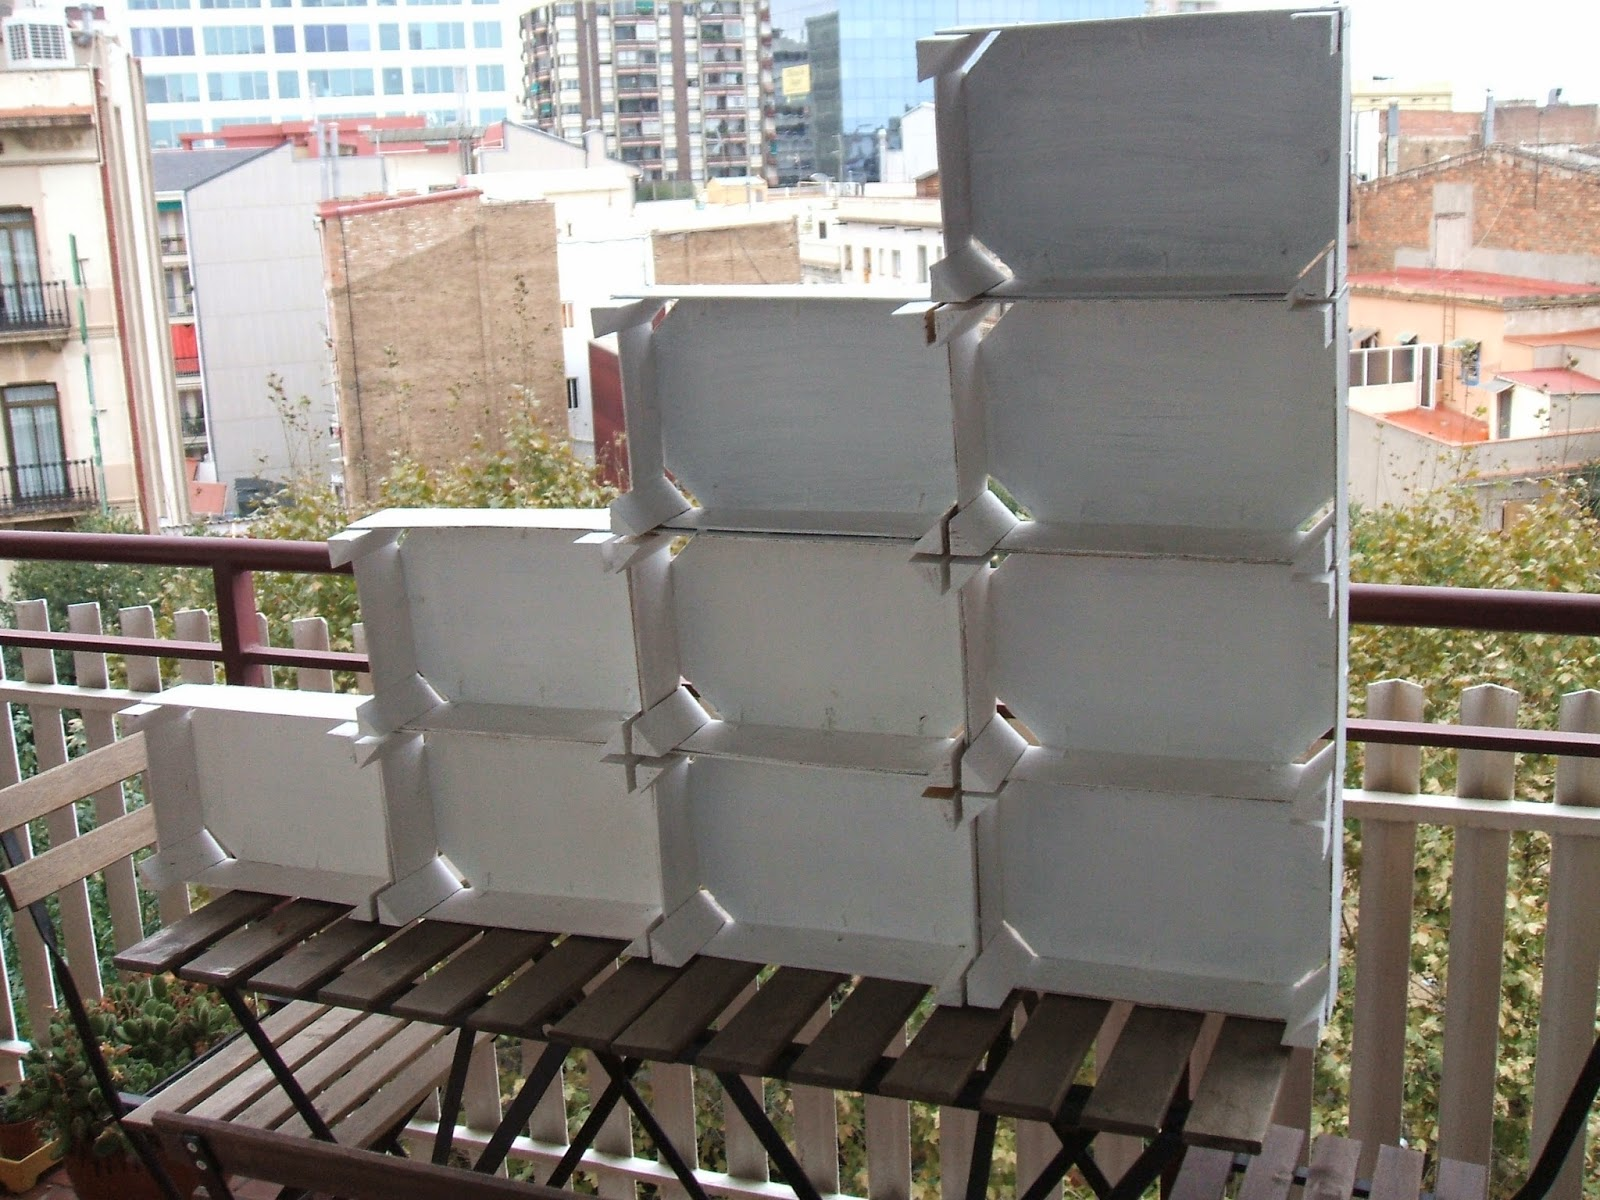 Estanteria cajas aprender manualidades es - Cajas para estanterias ...